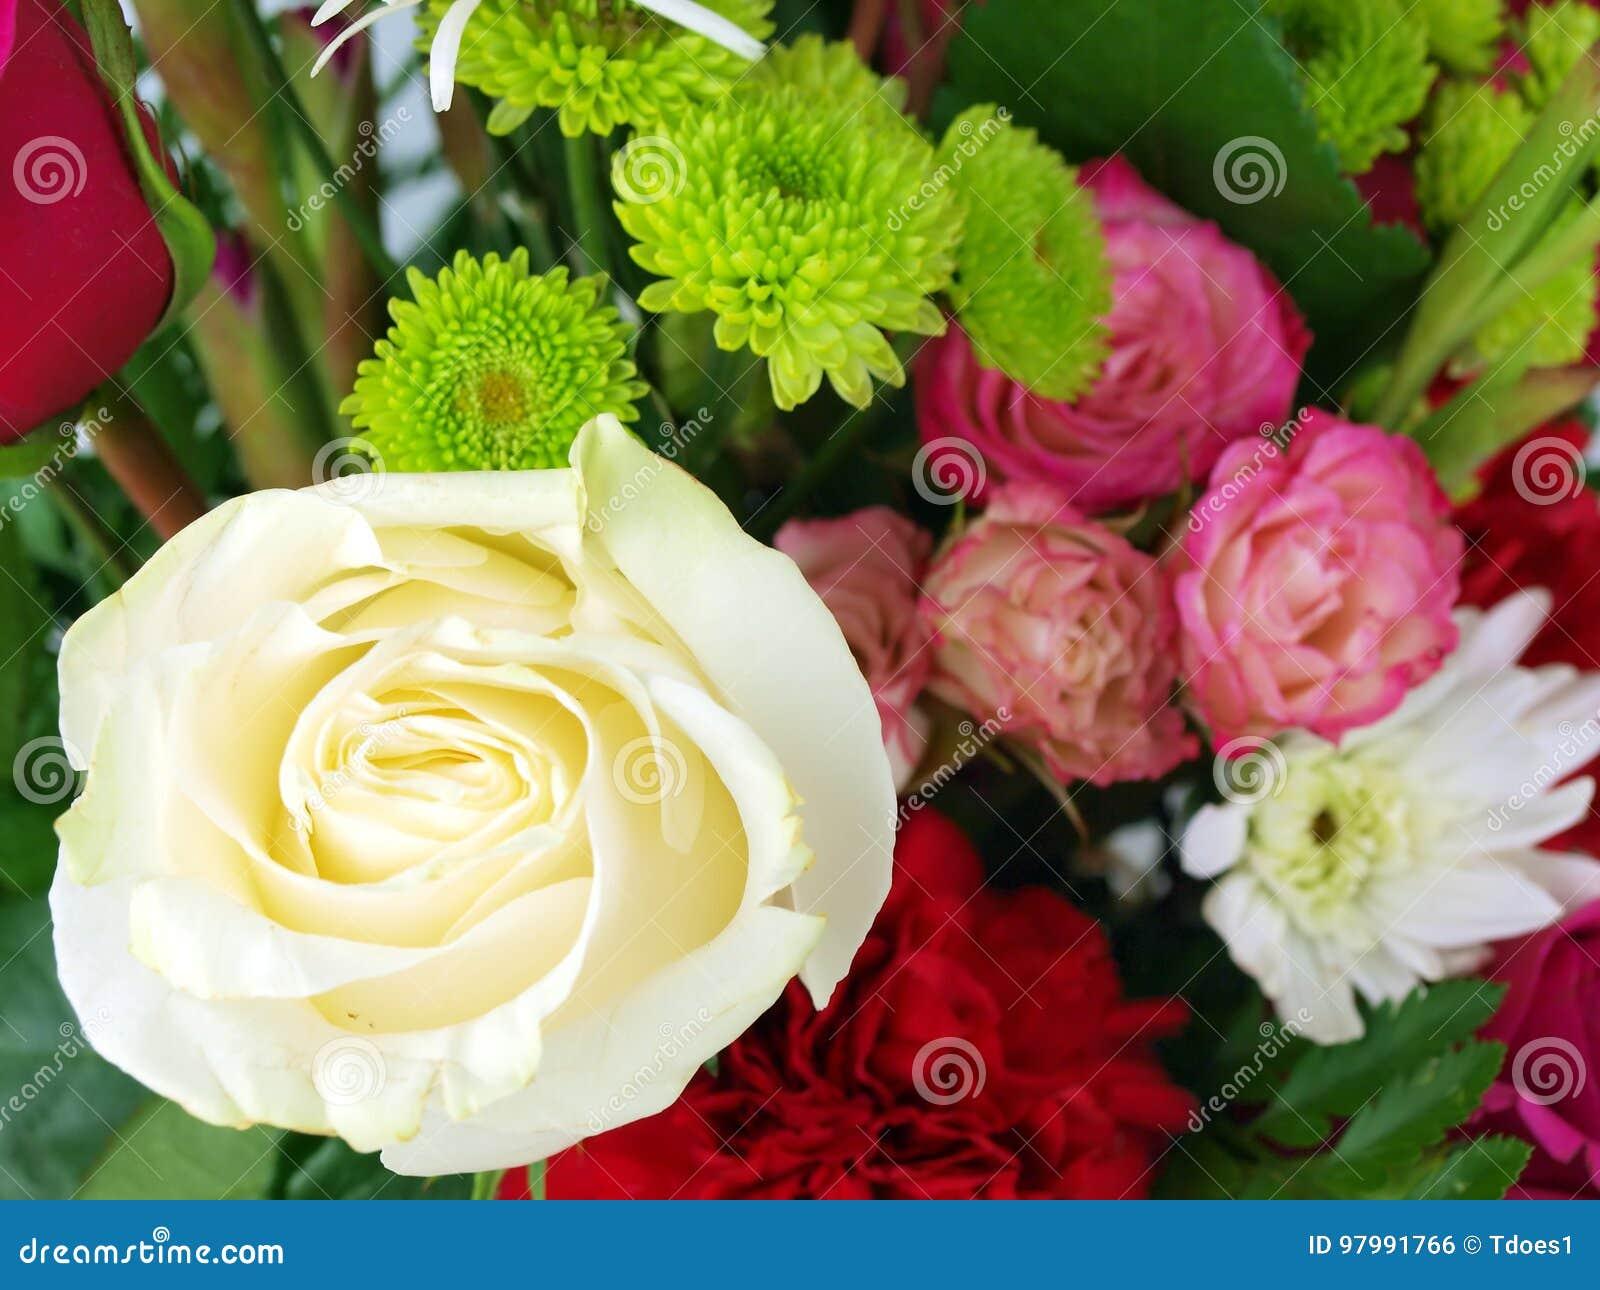 Flower Bouquet Rose Stock Photo Image Of Seasonal 97991766